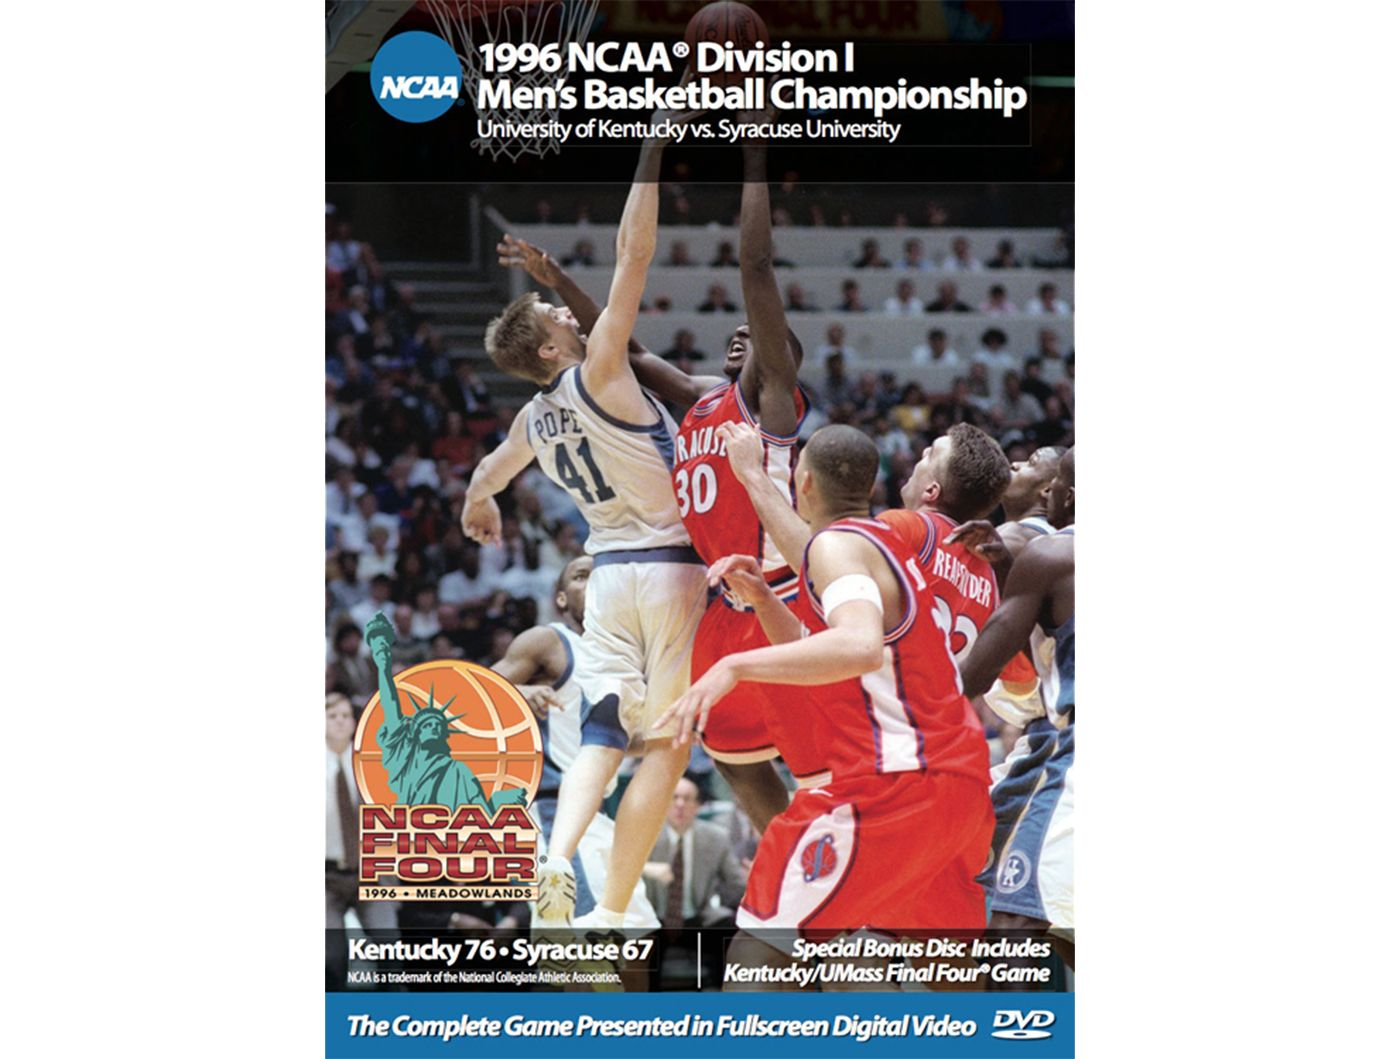 1996 NCAA Men's Basketball Championship Game - Kentucky vs. Syracuse DVD